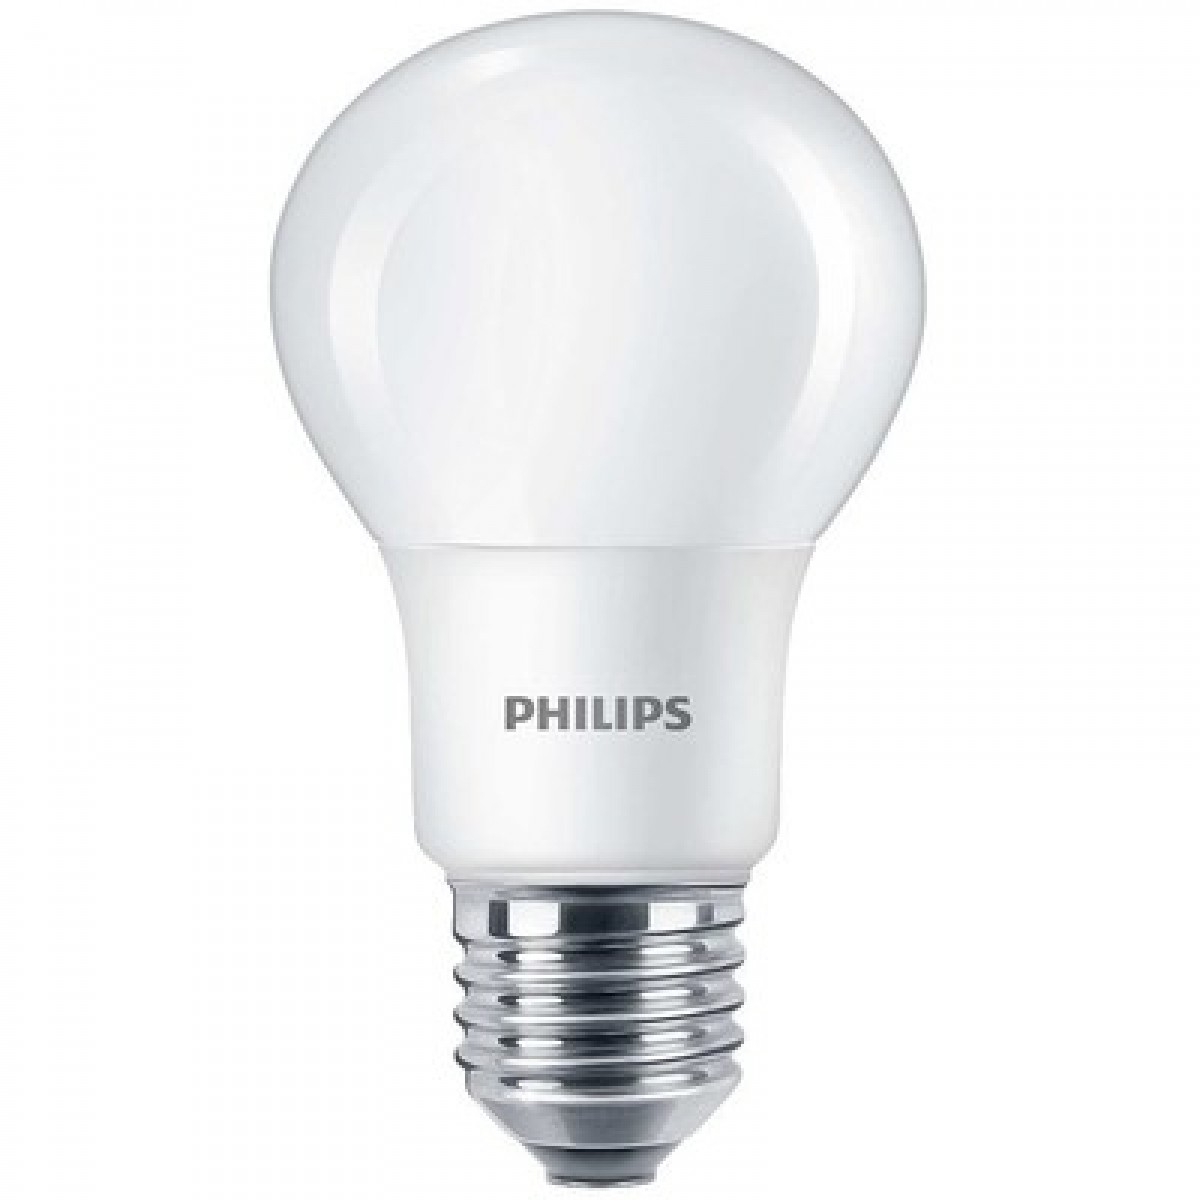 PHILIPS LED pærer standard mat 5,5W (40W)